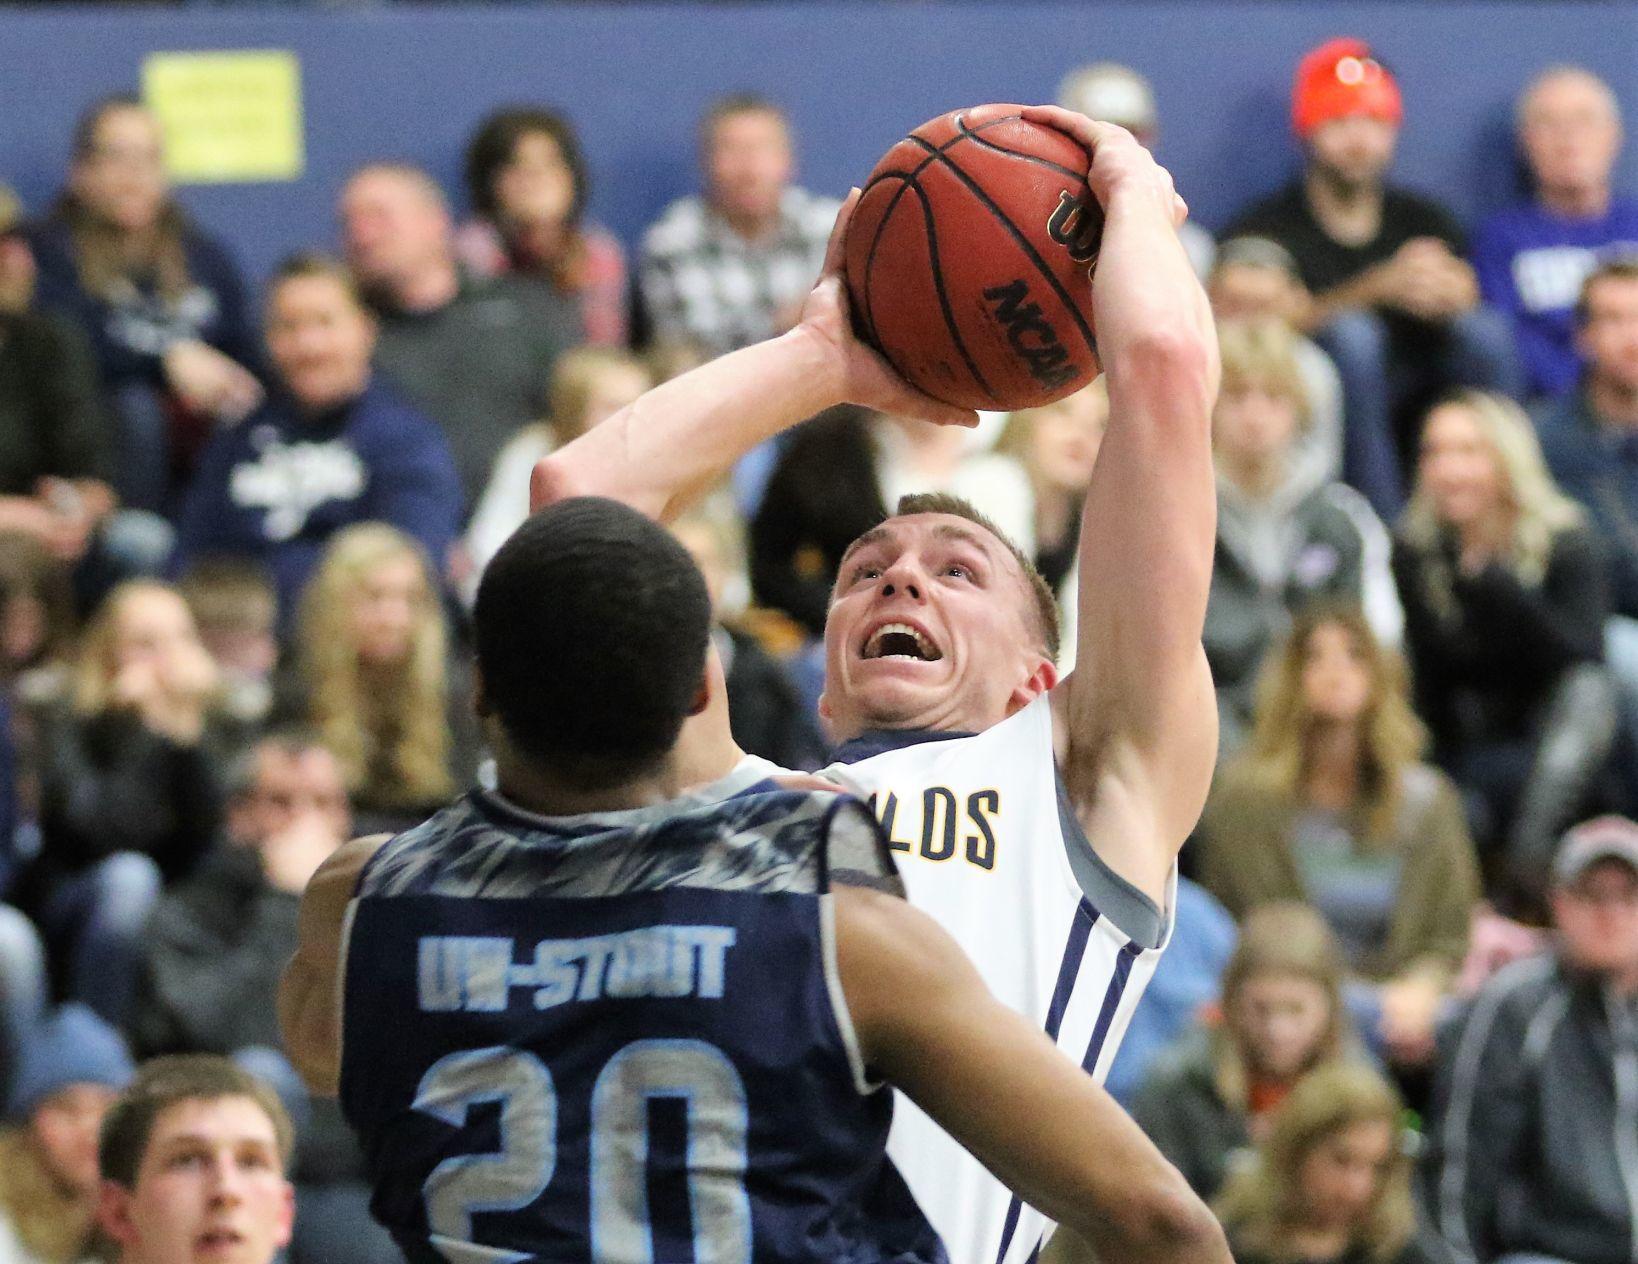 Oshkosh west basketball player sex assault